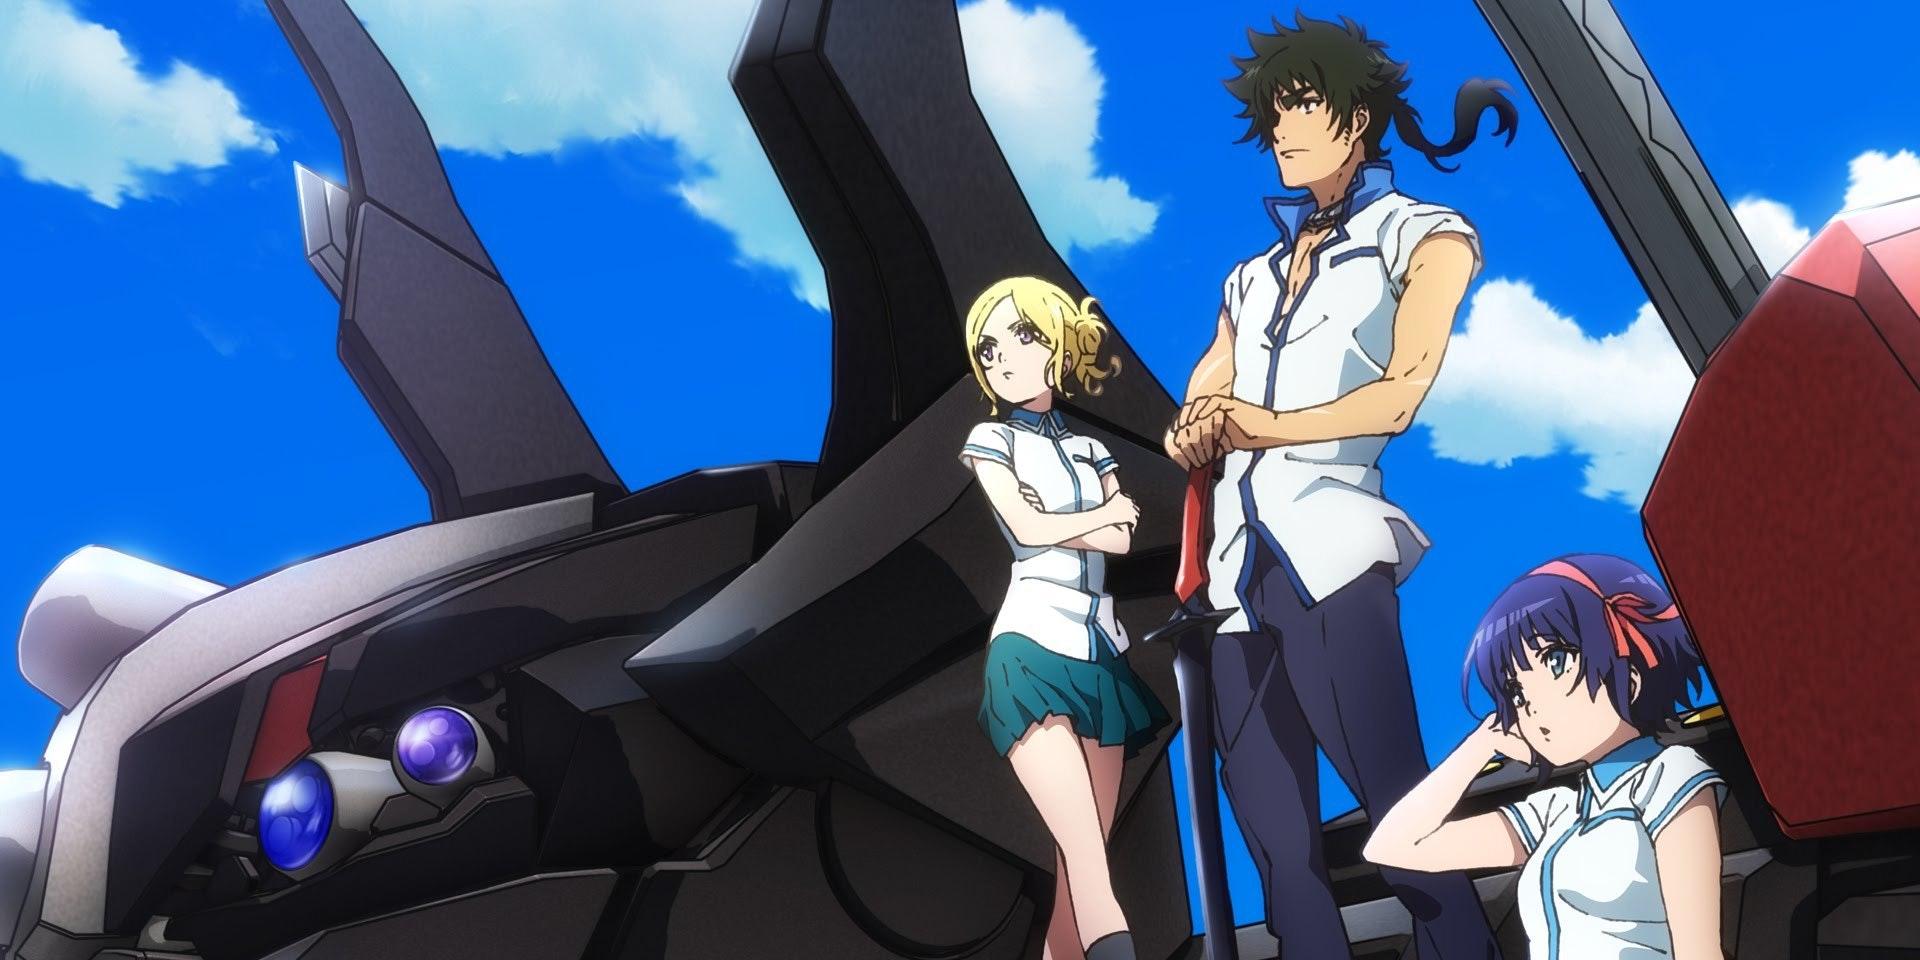 What Netflix's 'Kuromukuro' Should Take From Harem Anime Genre